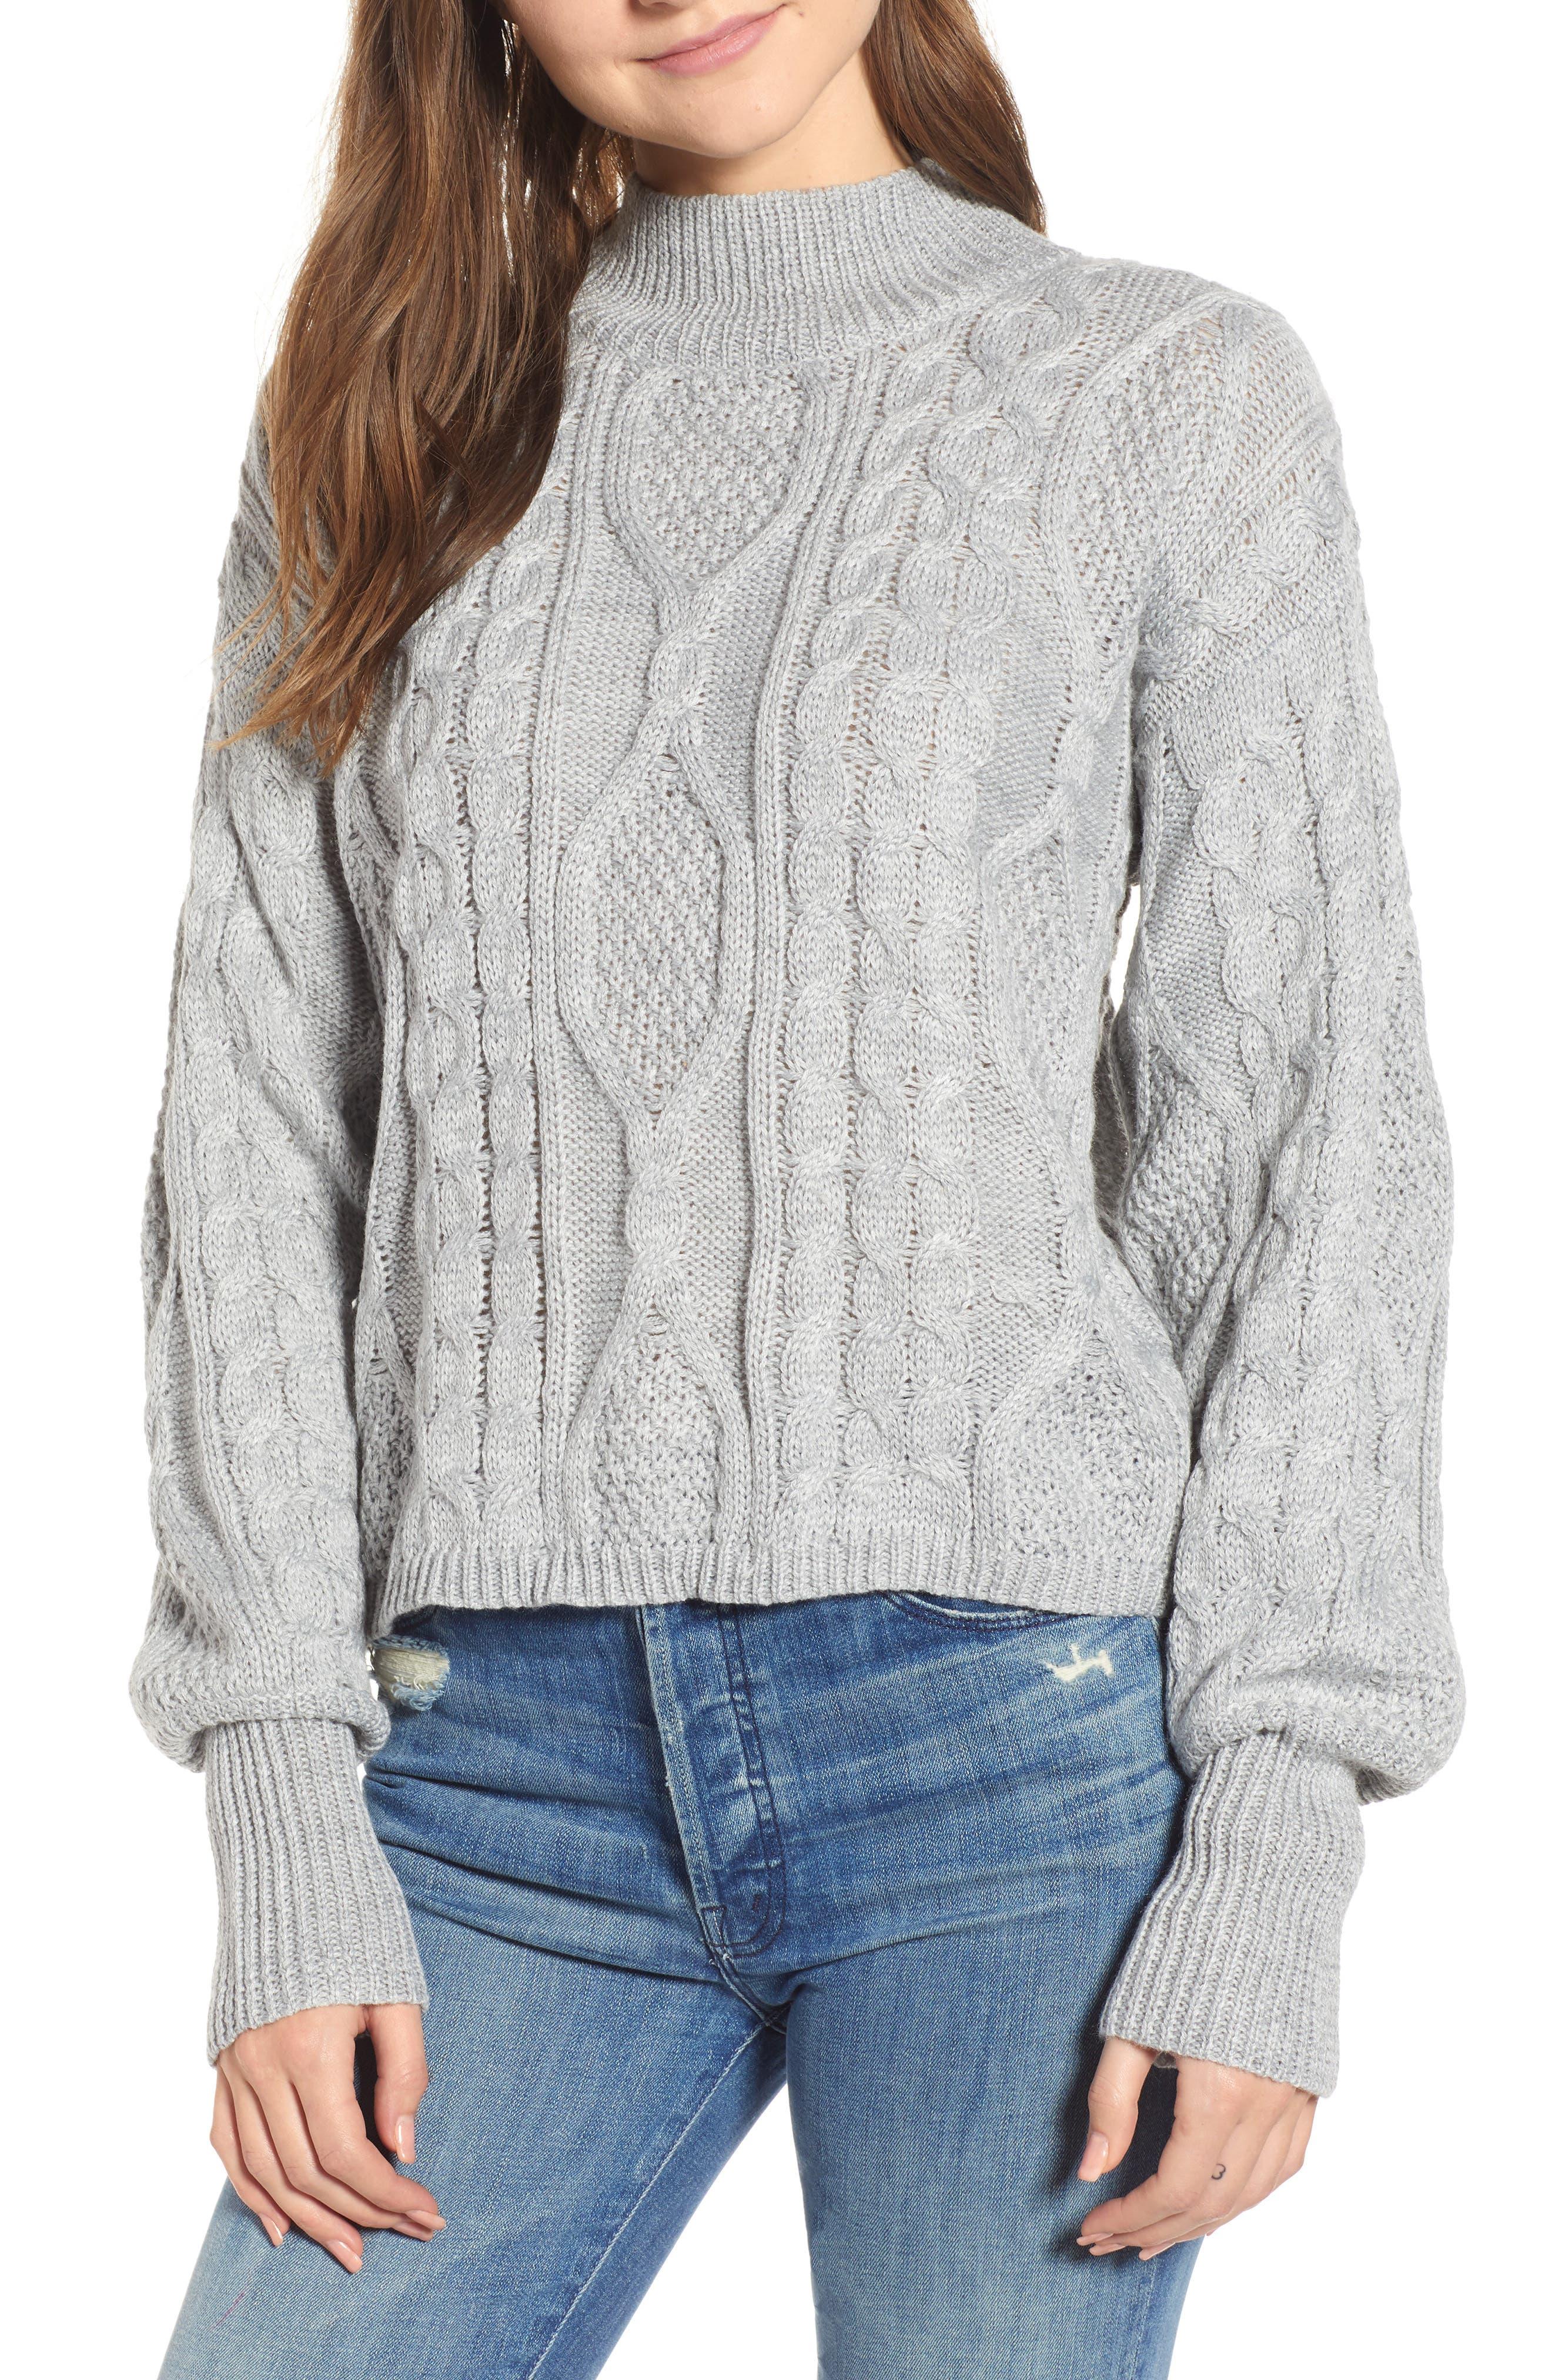 Dusk Till Dawn Cable Sweater,                             Main thumbnail 1, color,                             GREY